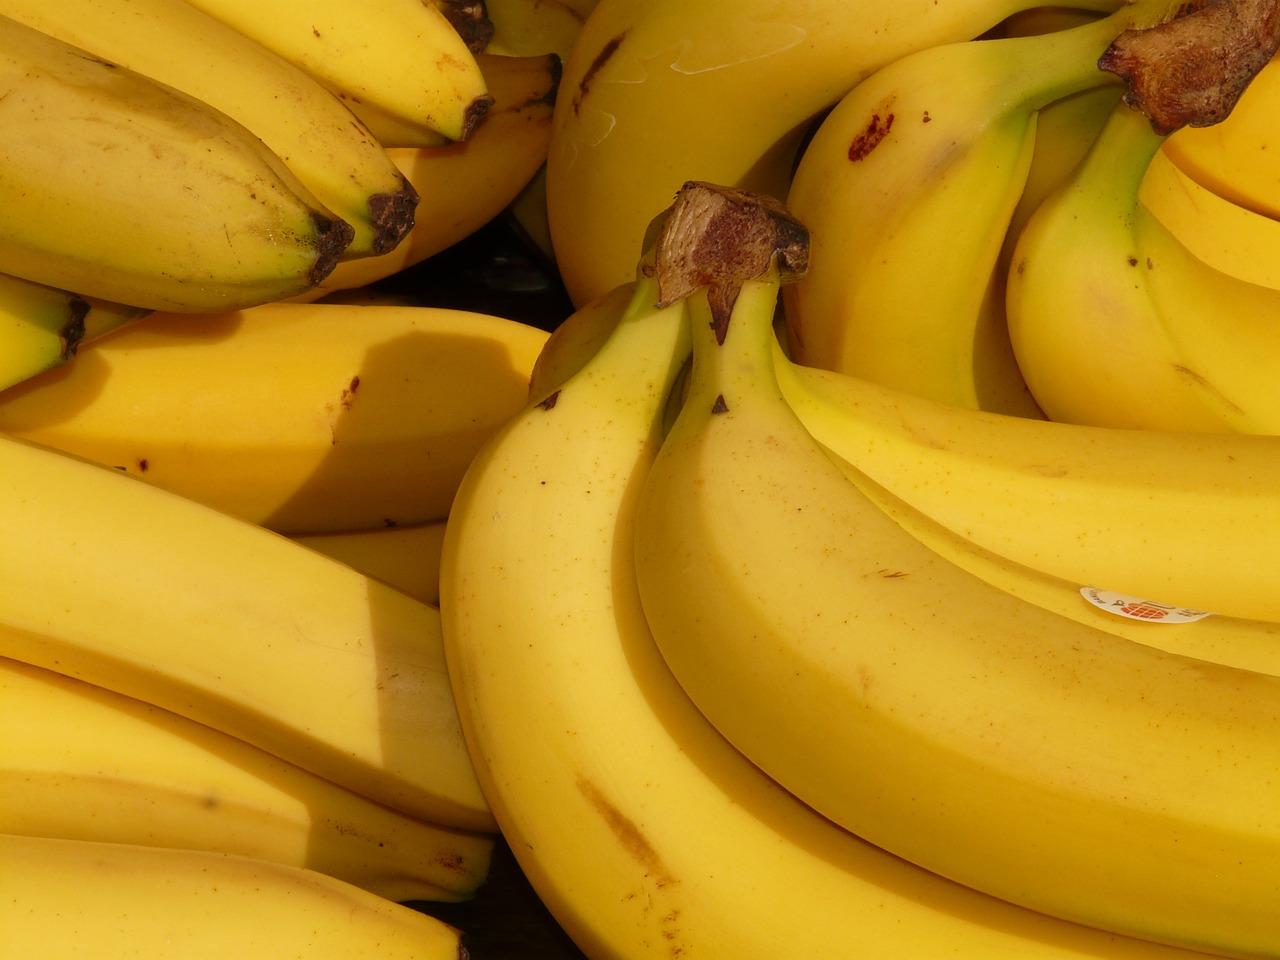 Receta de Pan de Plátano o Banana Bread (receta norteamericana) - Plátanos